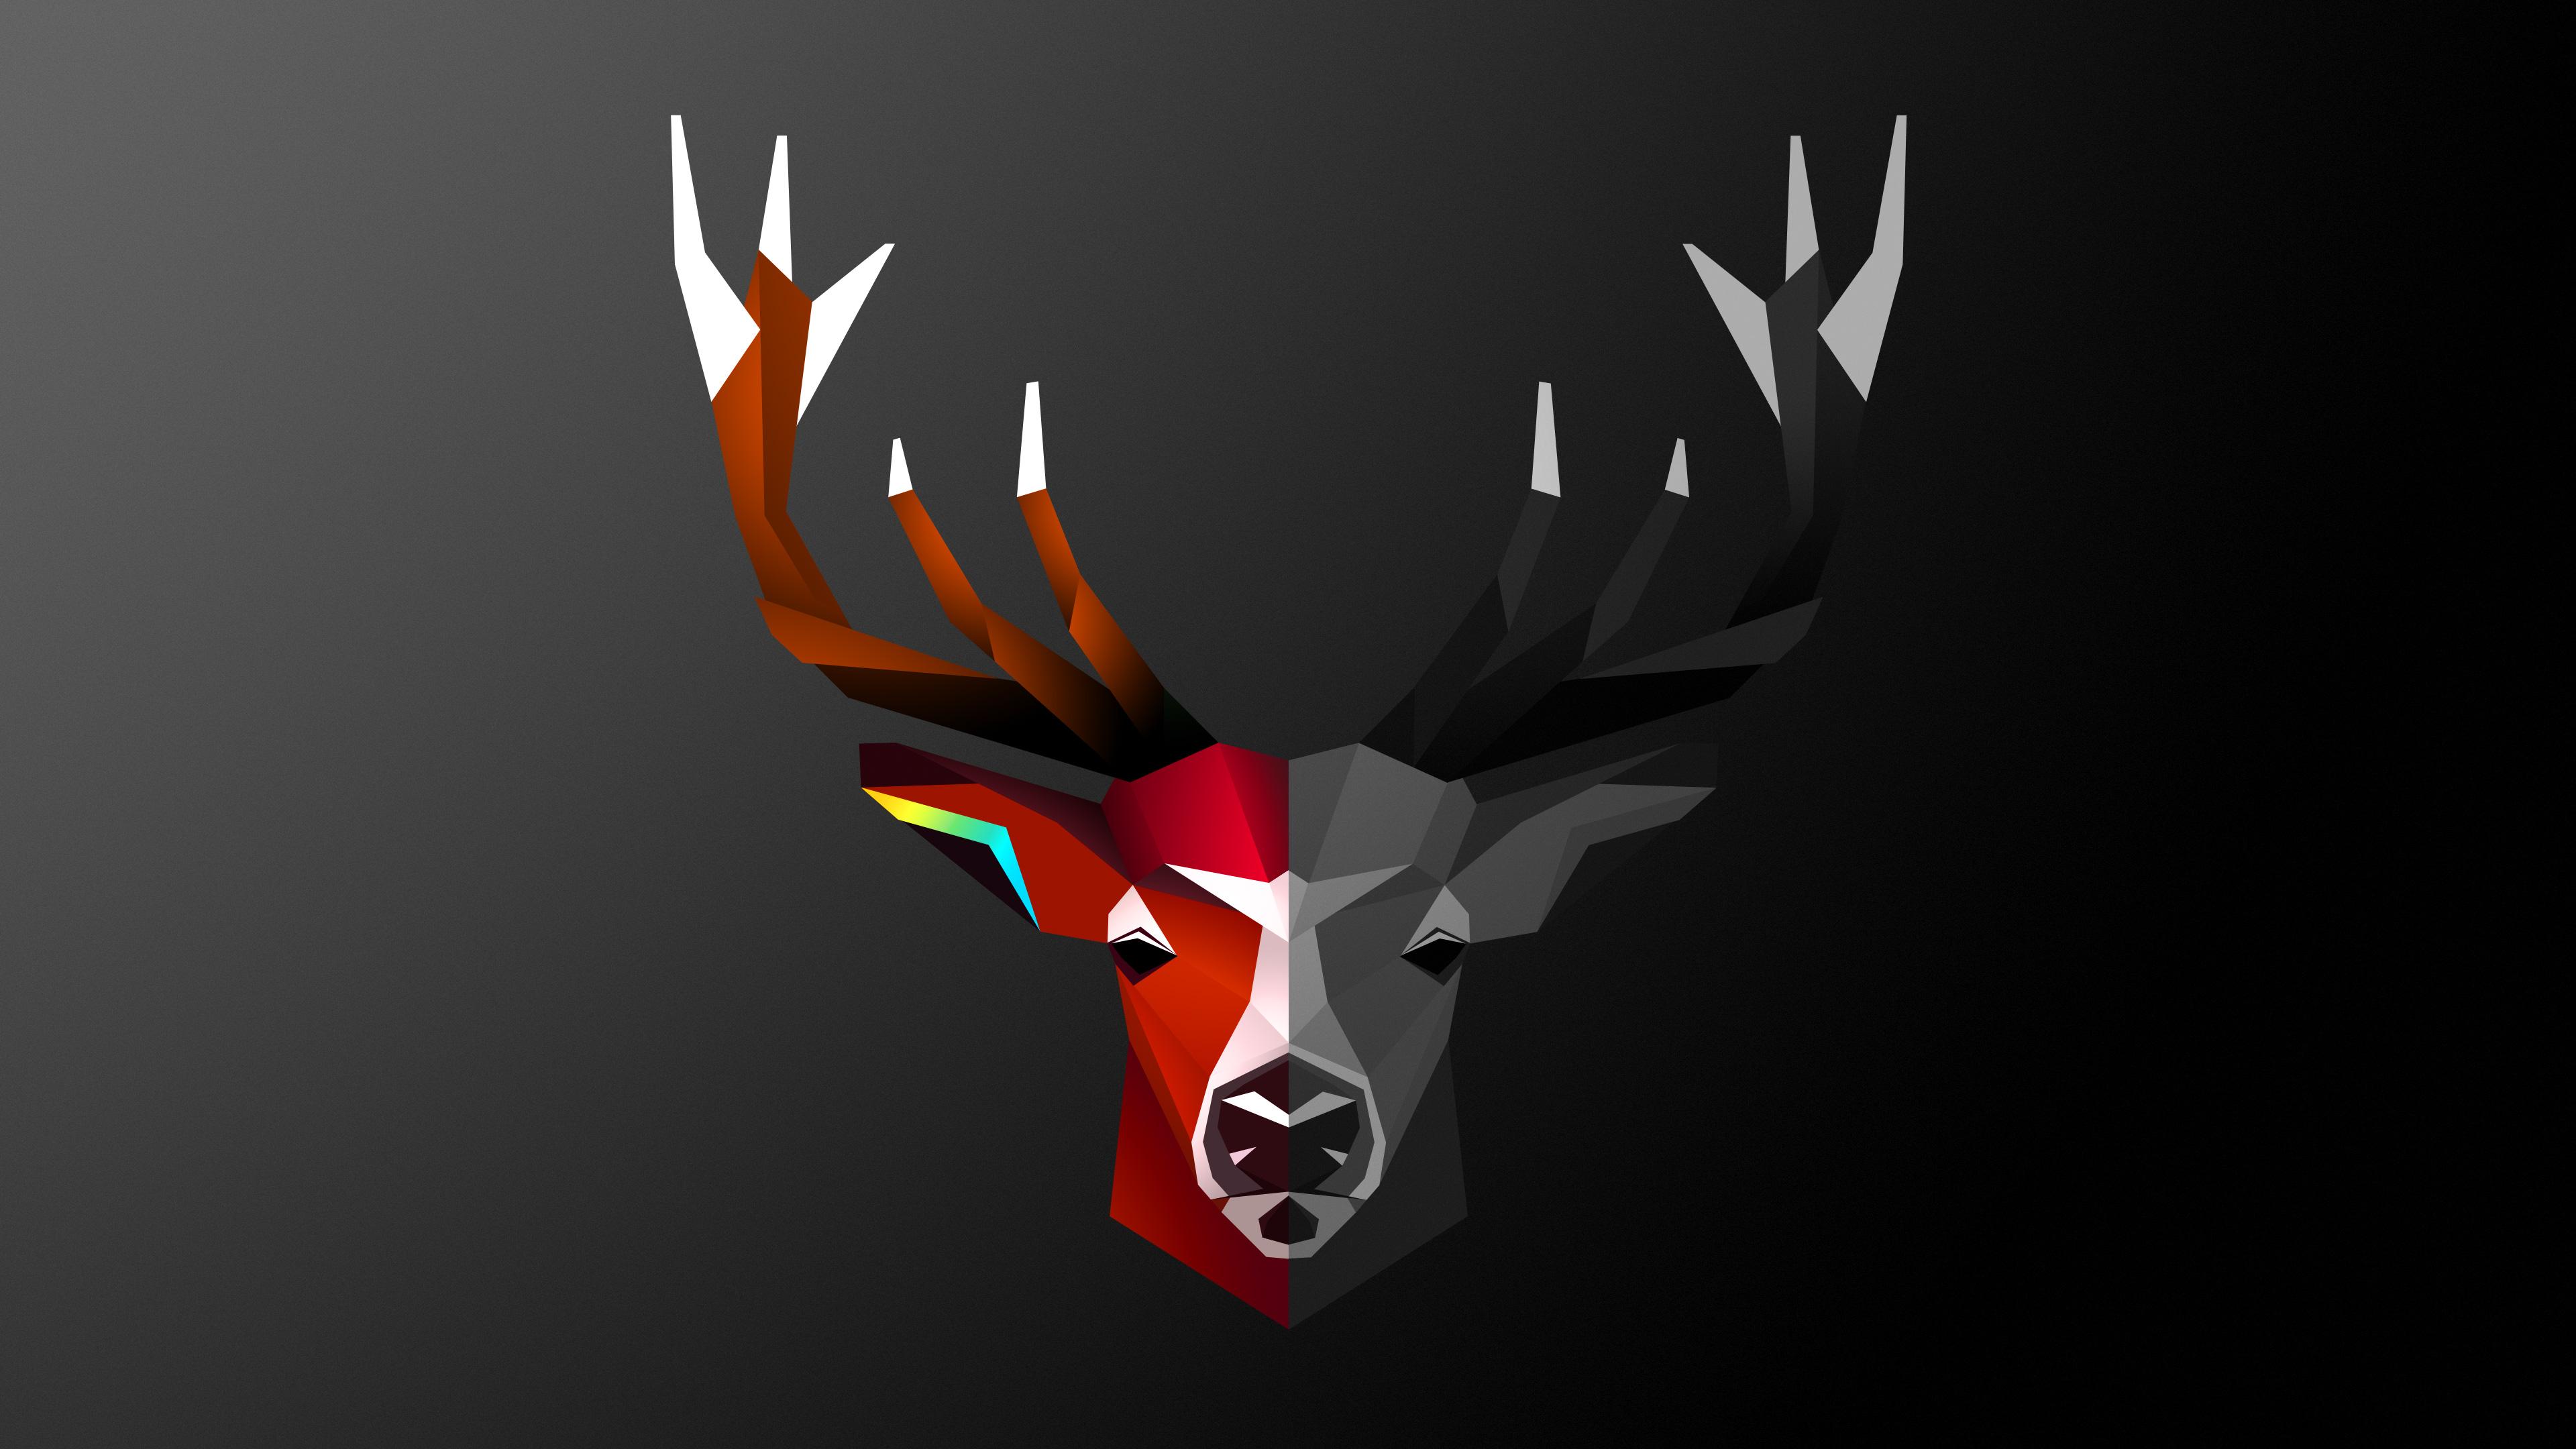 abstract deer 4k 1539371037 - Abstract Deer 4k - digital art wallpapers, deviantart wallpapers, deer wallpapers, artist wallpapers, abstract wallpapers, 4k-wallpapers